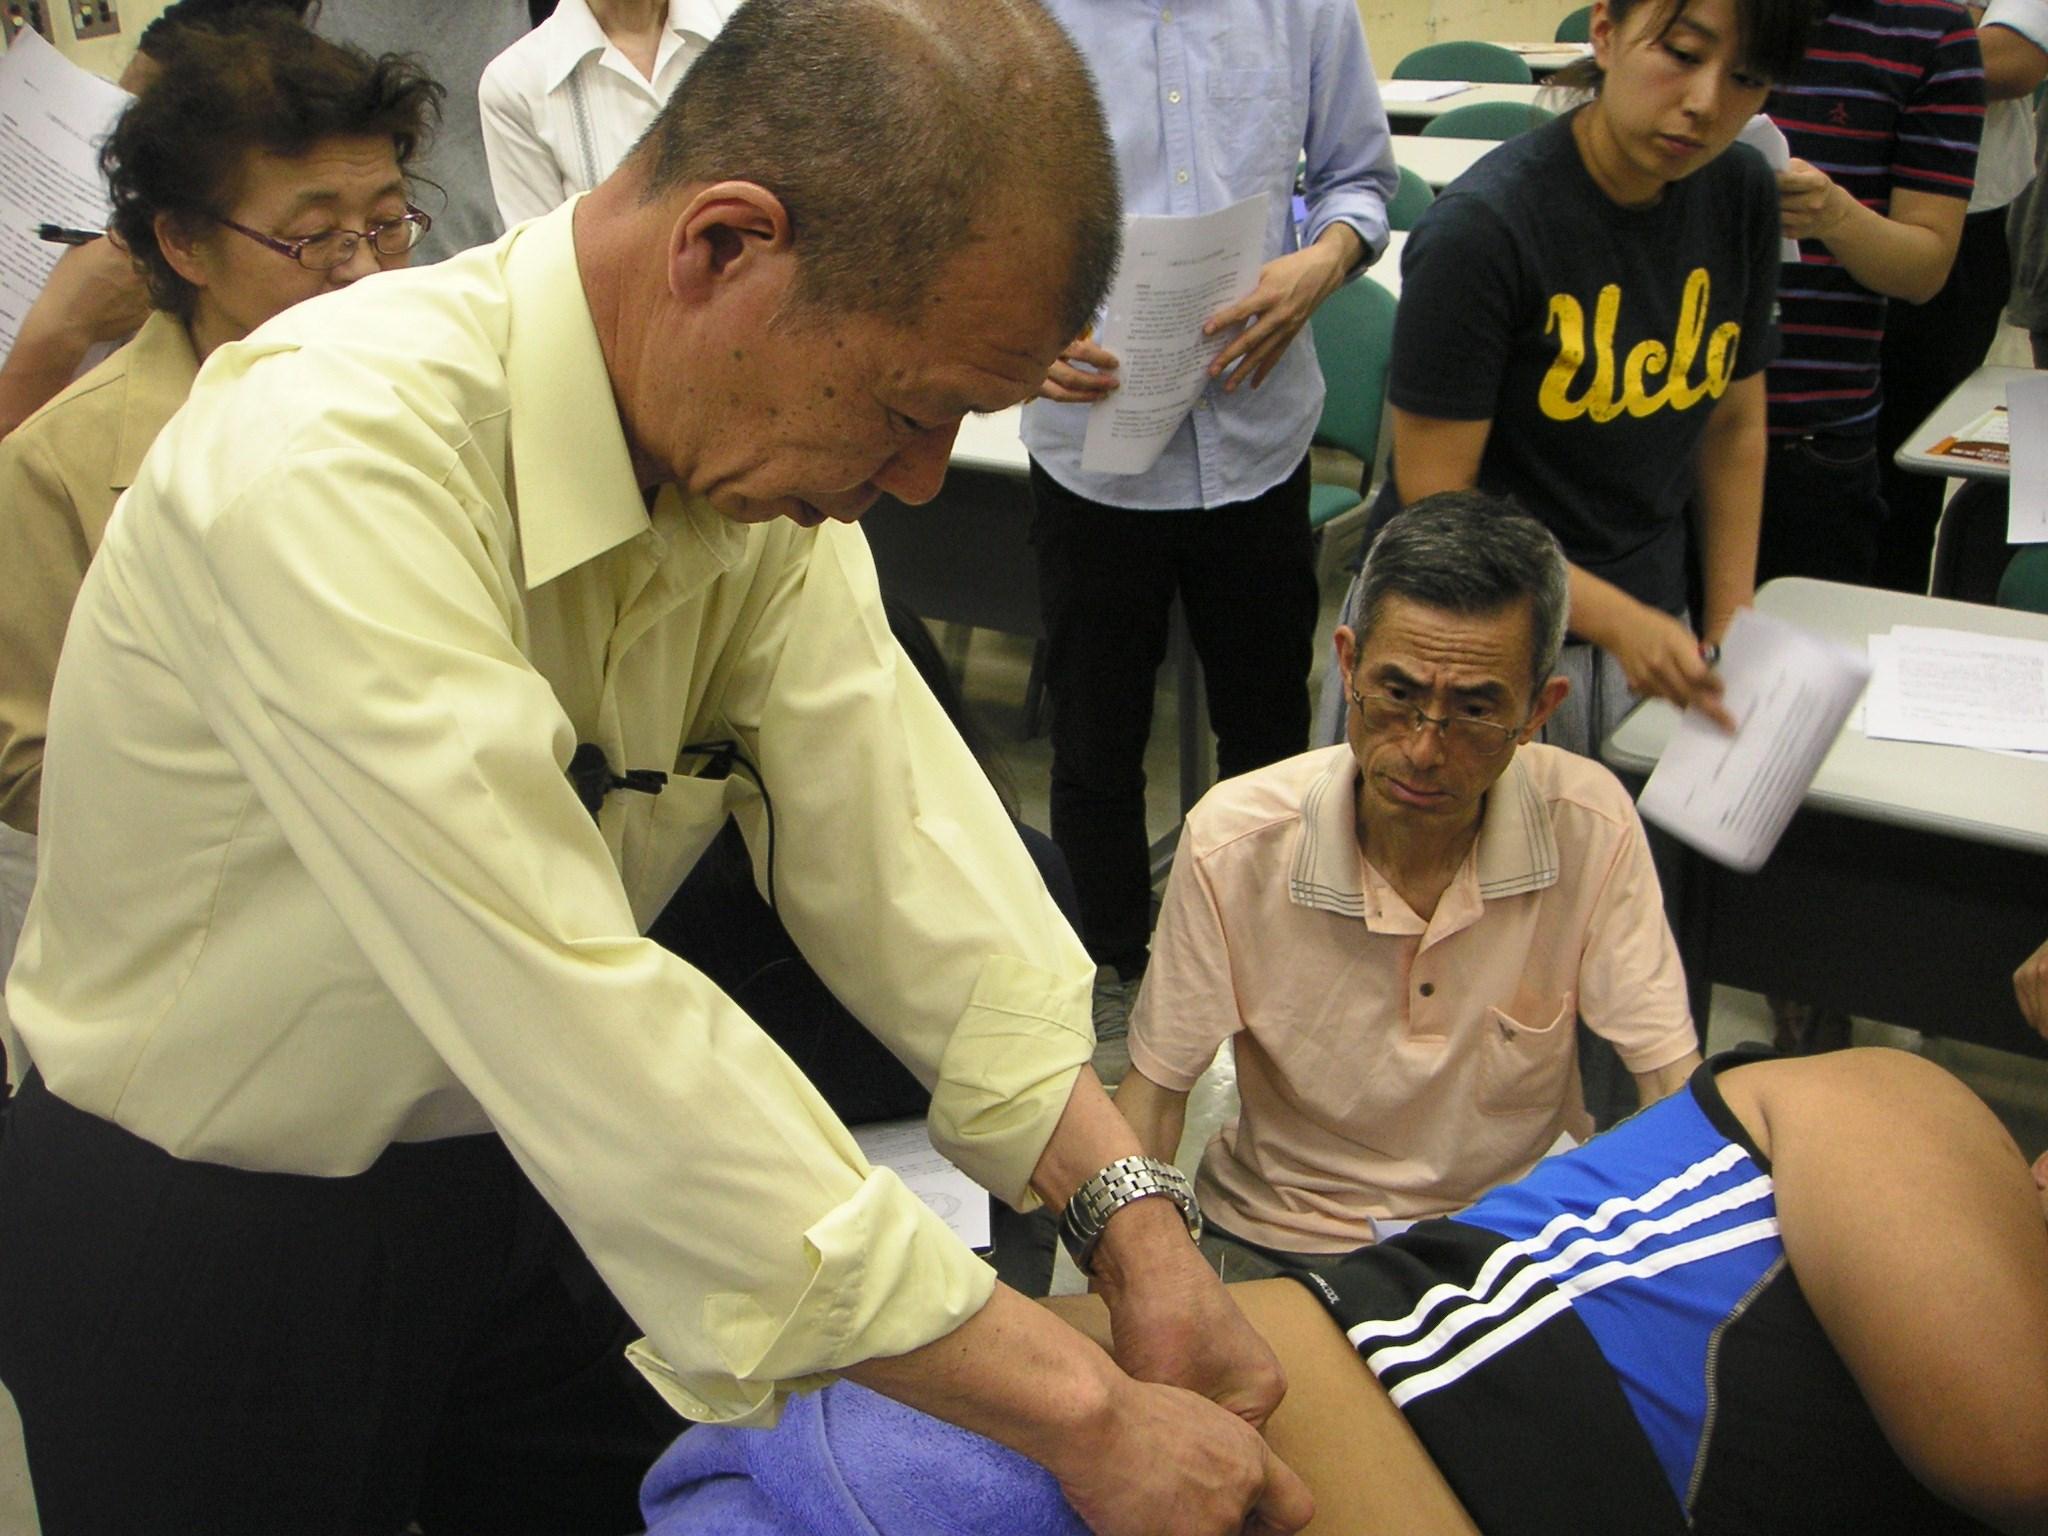 4月23日実施 臨床のコツ:「帯状疱疹後肋間神経痛の鍼灸治療」 加島 郁雄(千代田)